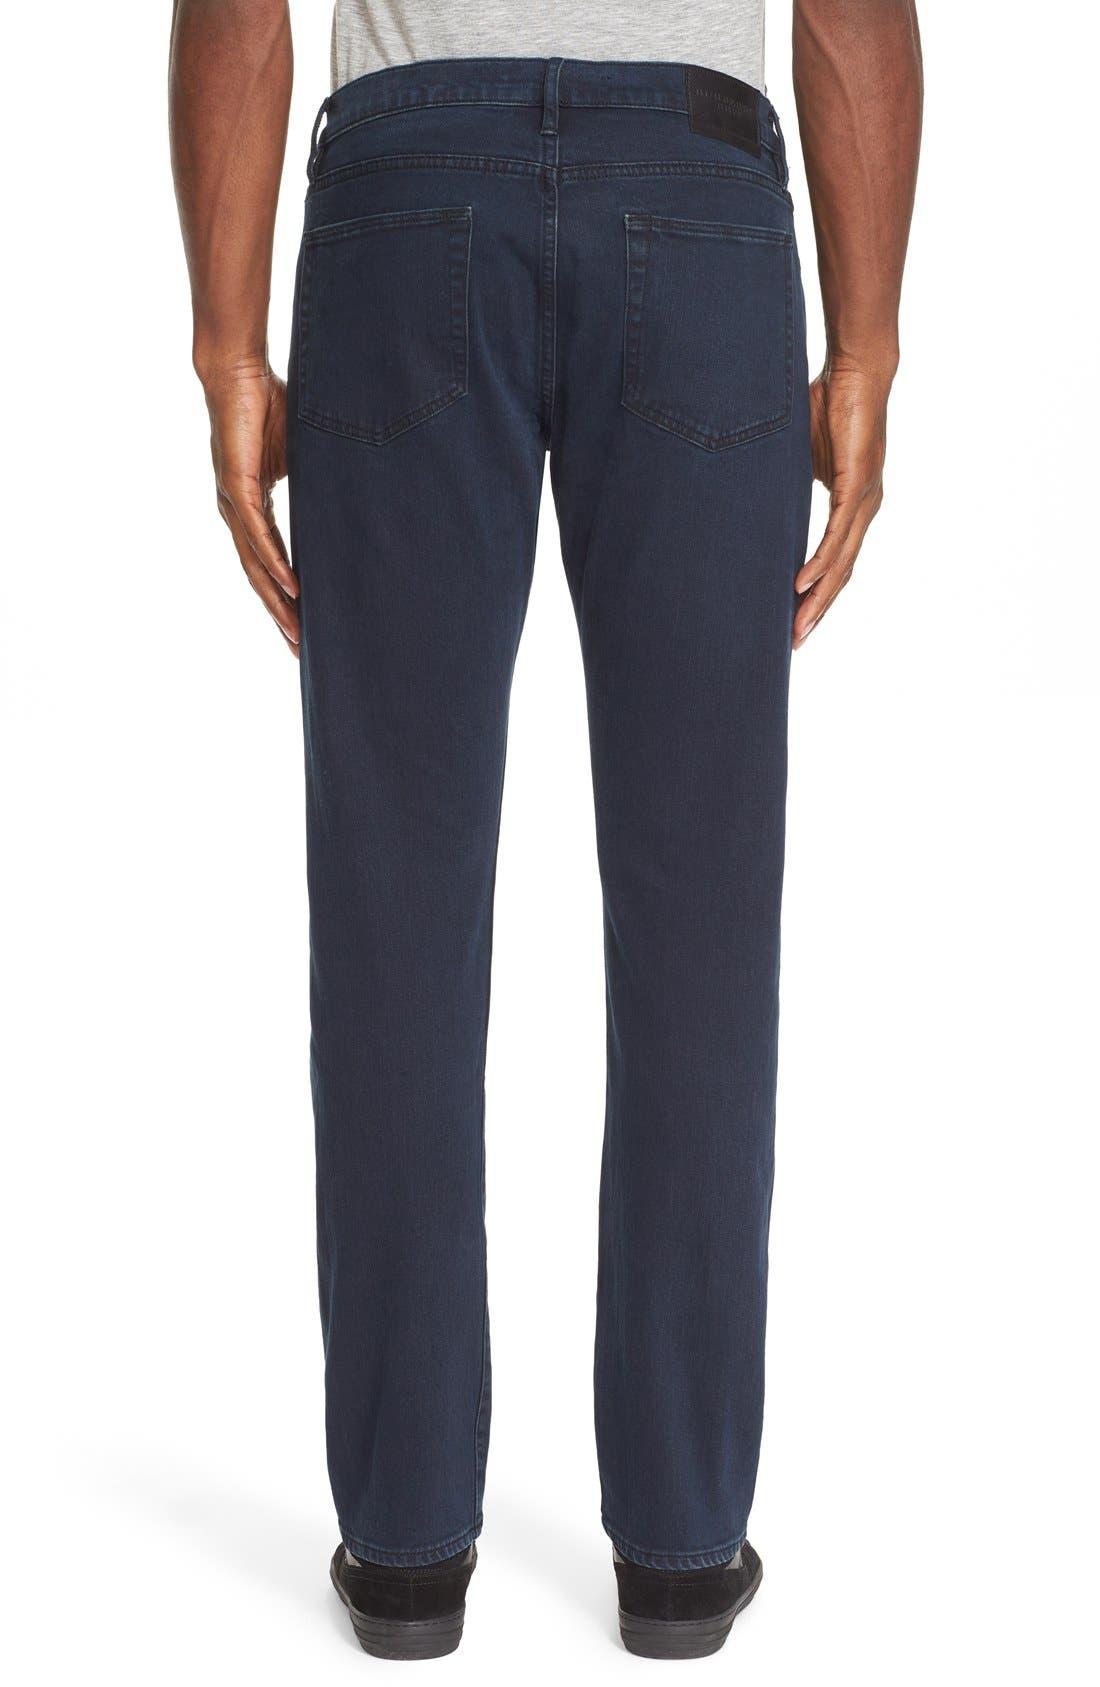 Straight Leg Jeans Jeans,                             Alternate thumbnail 2, color,                             Dark Indigo